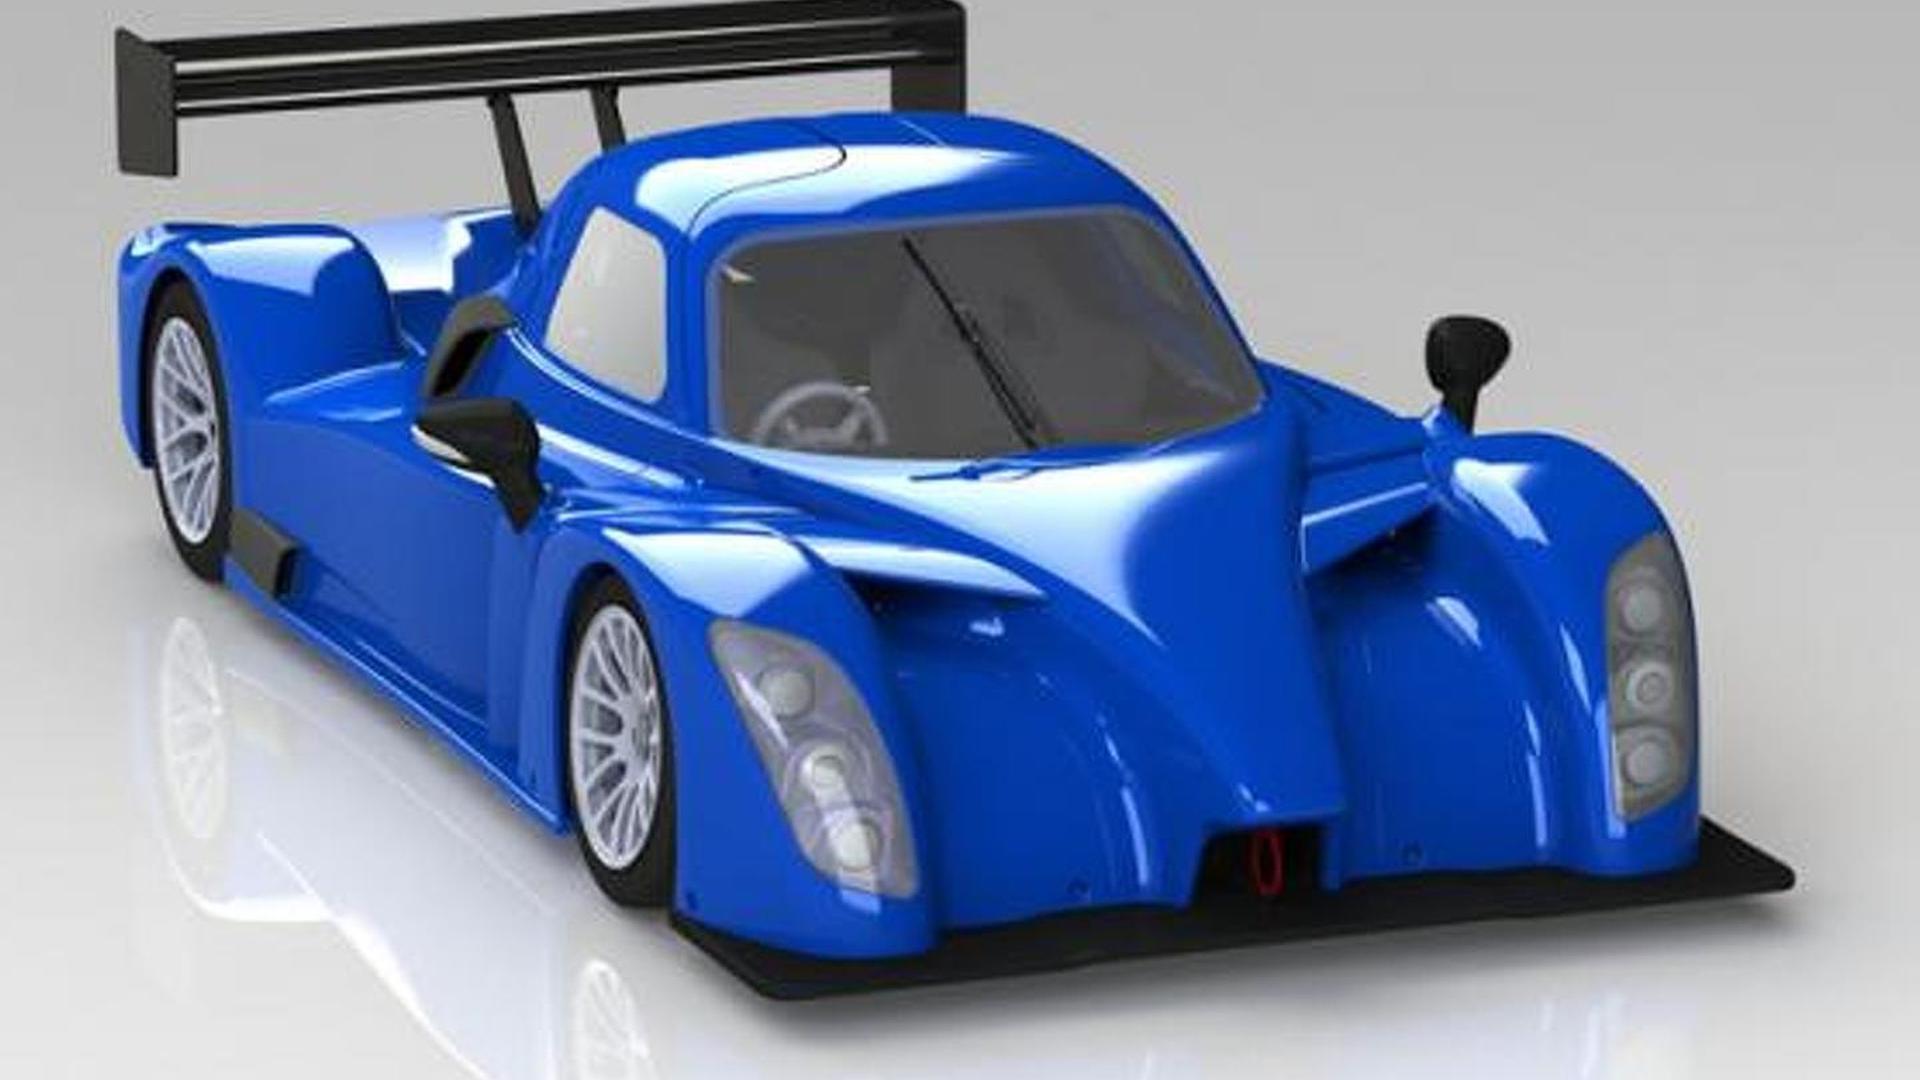 d5bbc7d0c Le Mans-inspired Radical RXC Xtreme Coupe announced